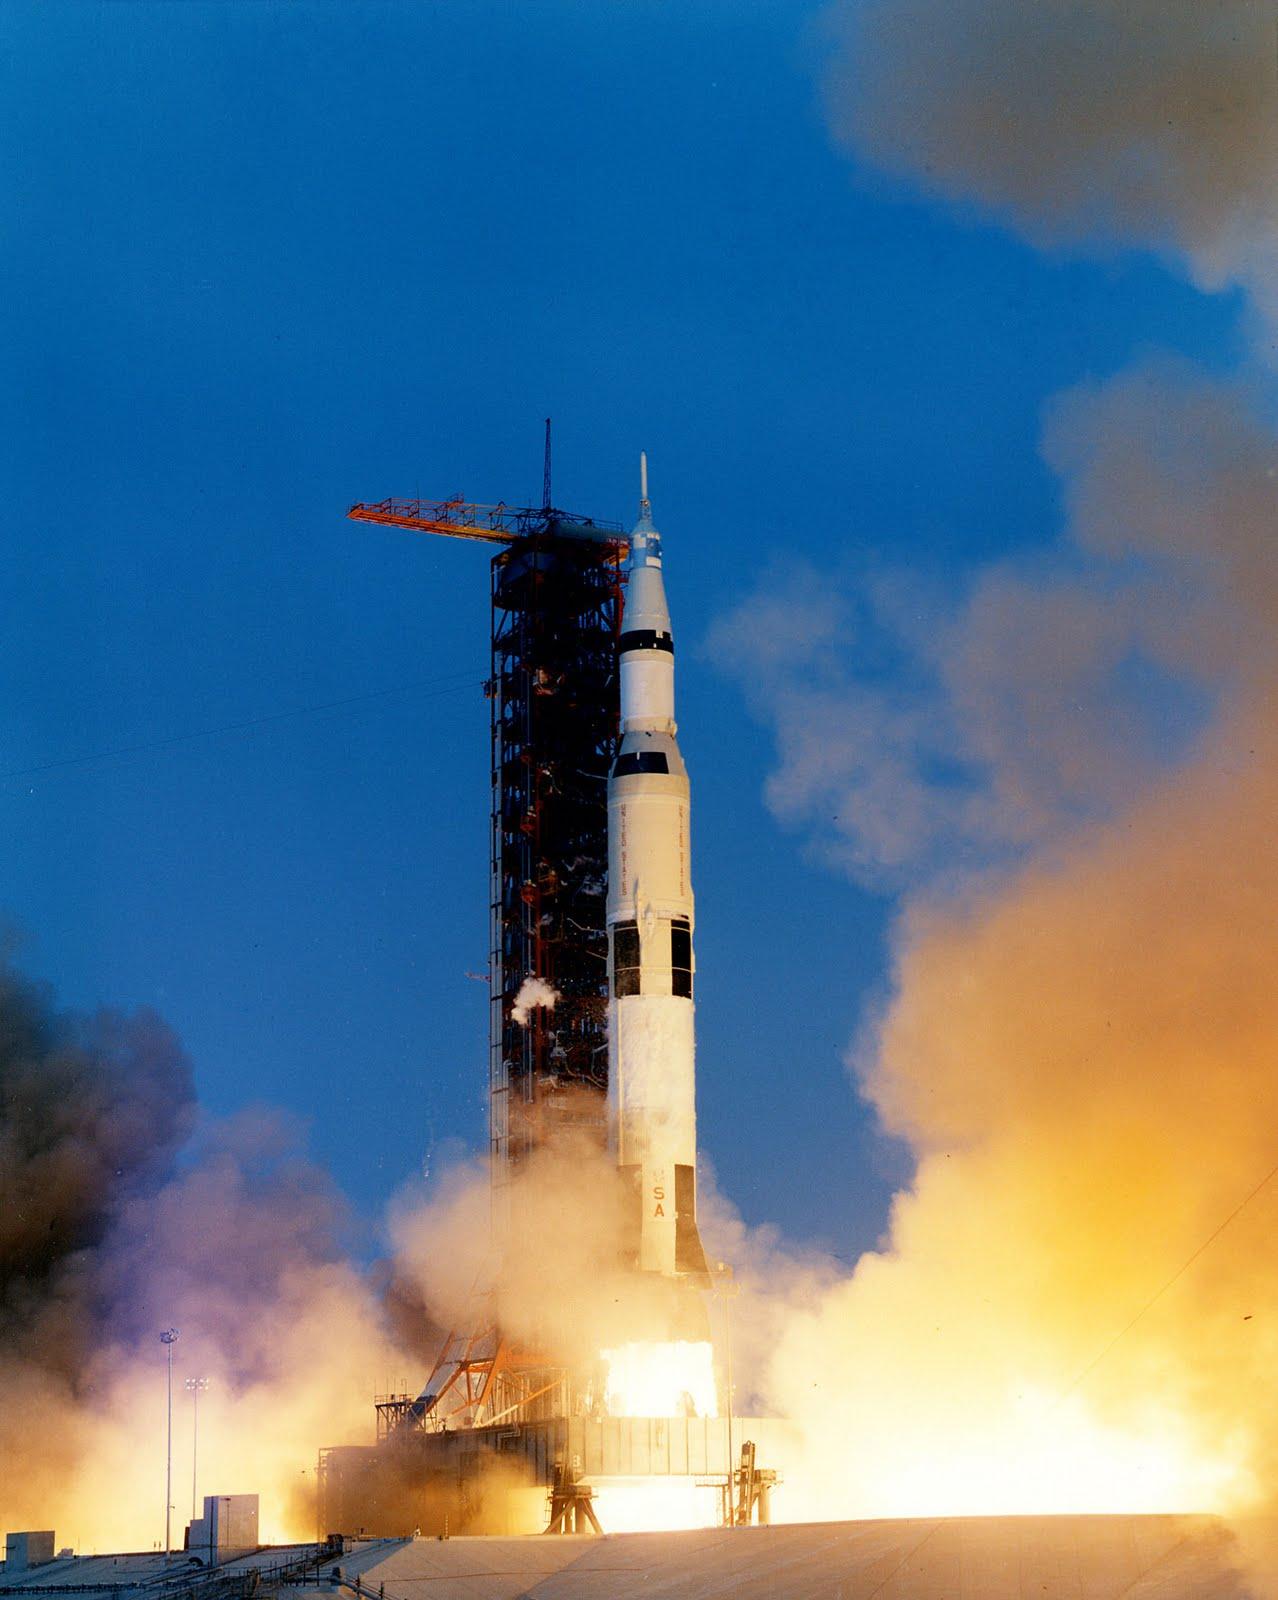 apollo 11 space mission launch date - photo #9